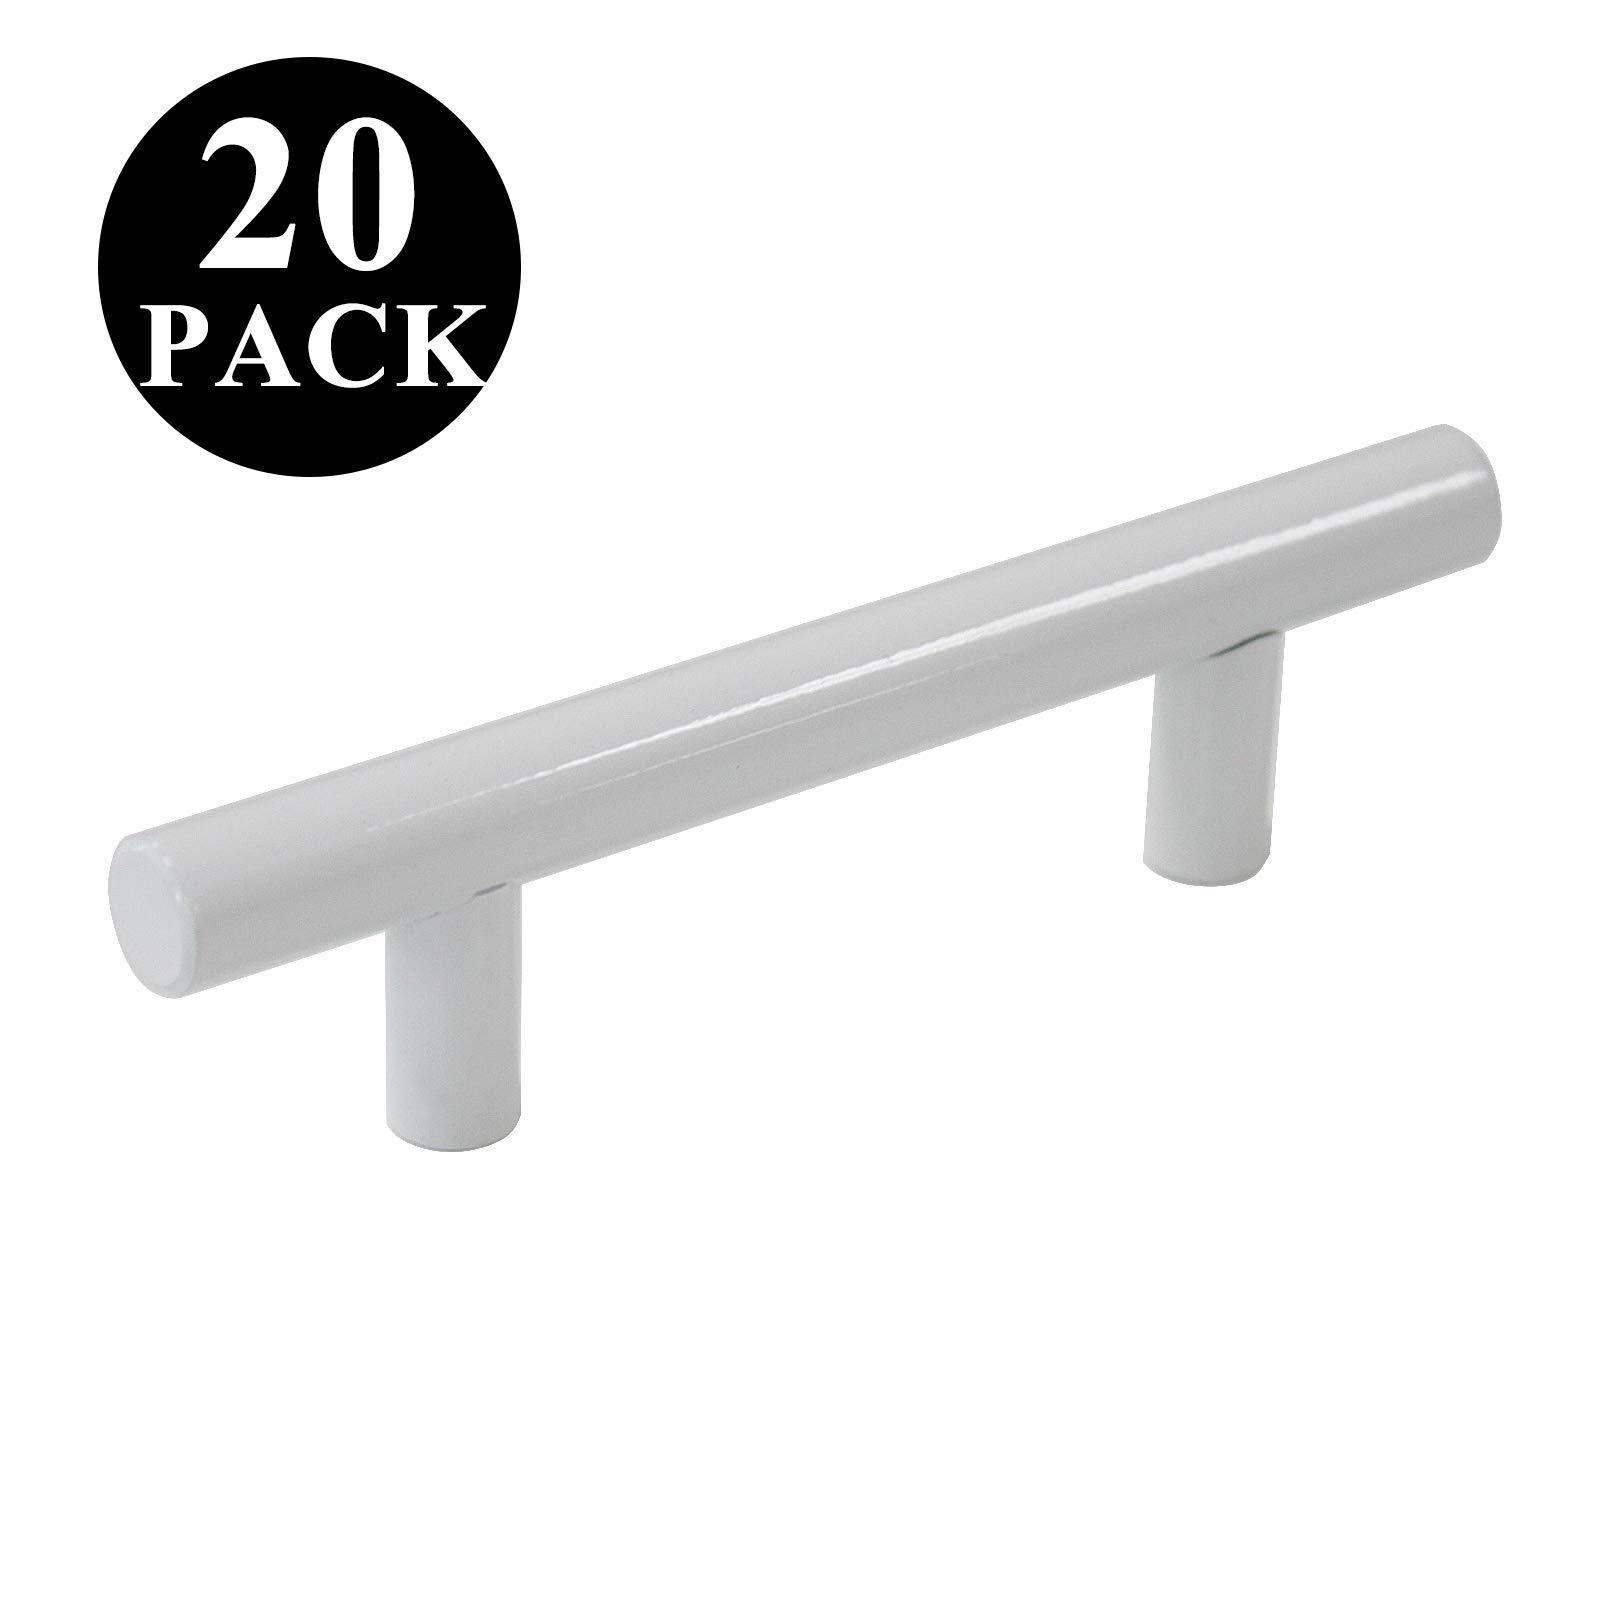 Probrico White Kitchen Cabinet Pulls 3 Inch Euro Style T Bar Handles Cupboard Stainless Steel Modern Cabinet Hardware, 20 Pack